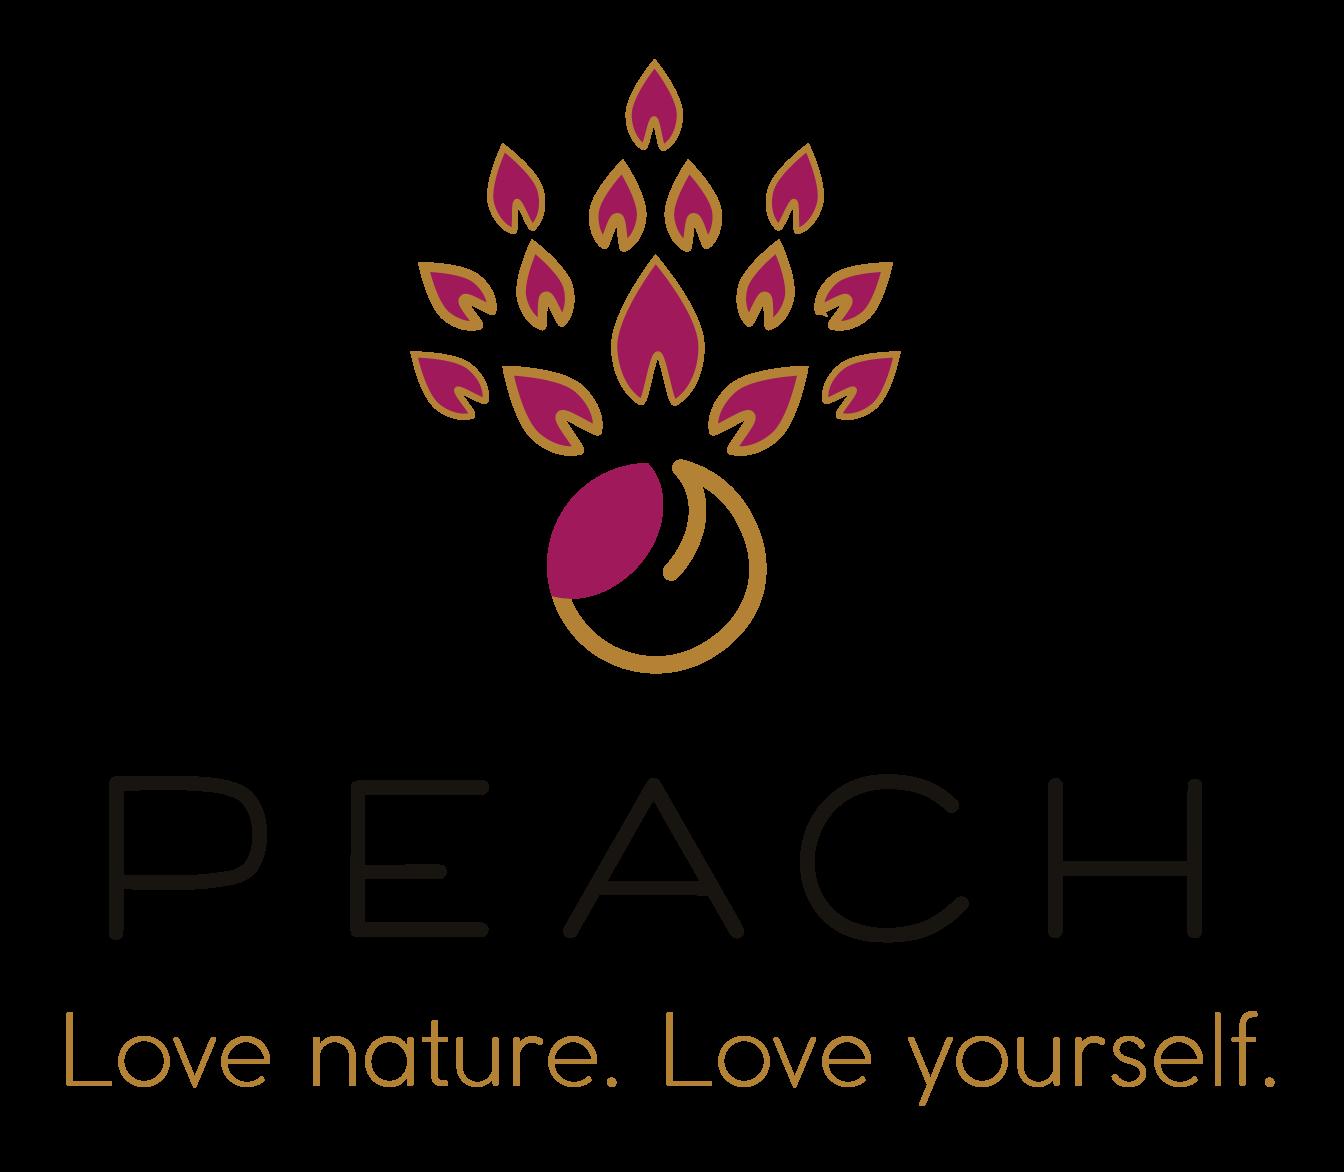 My Peach Store